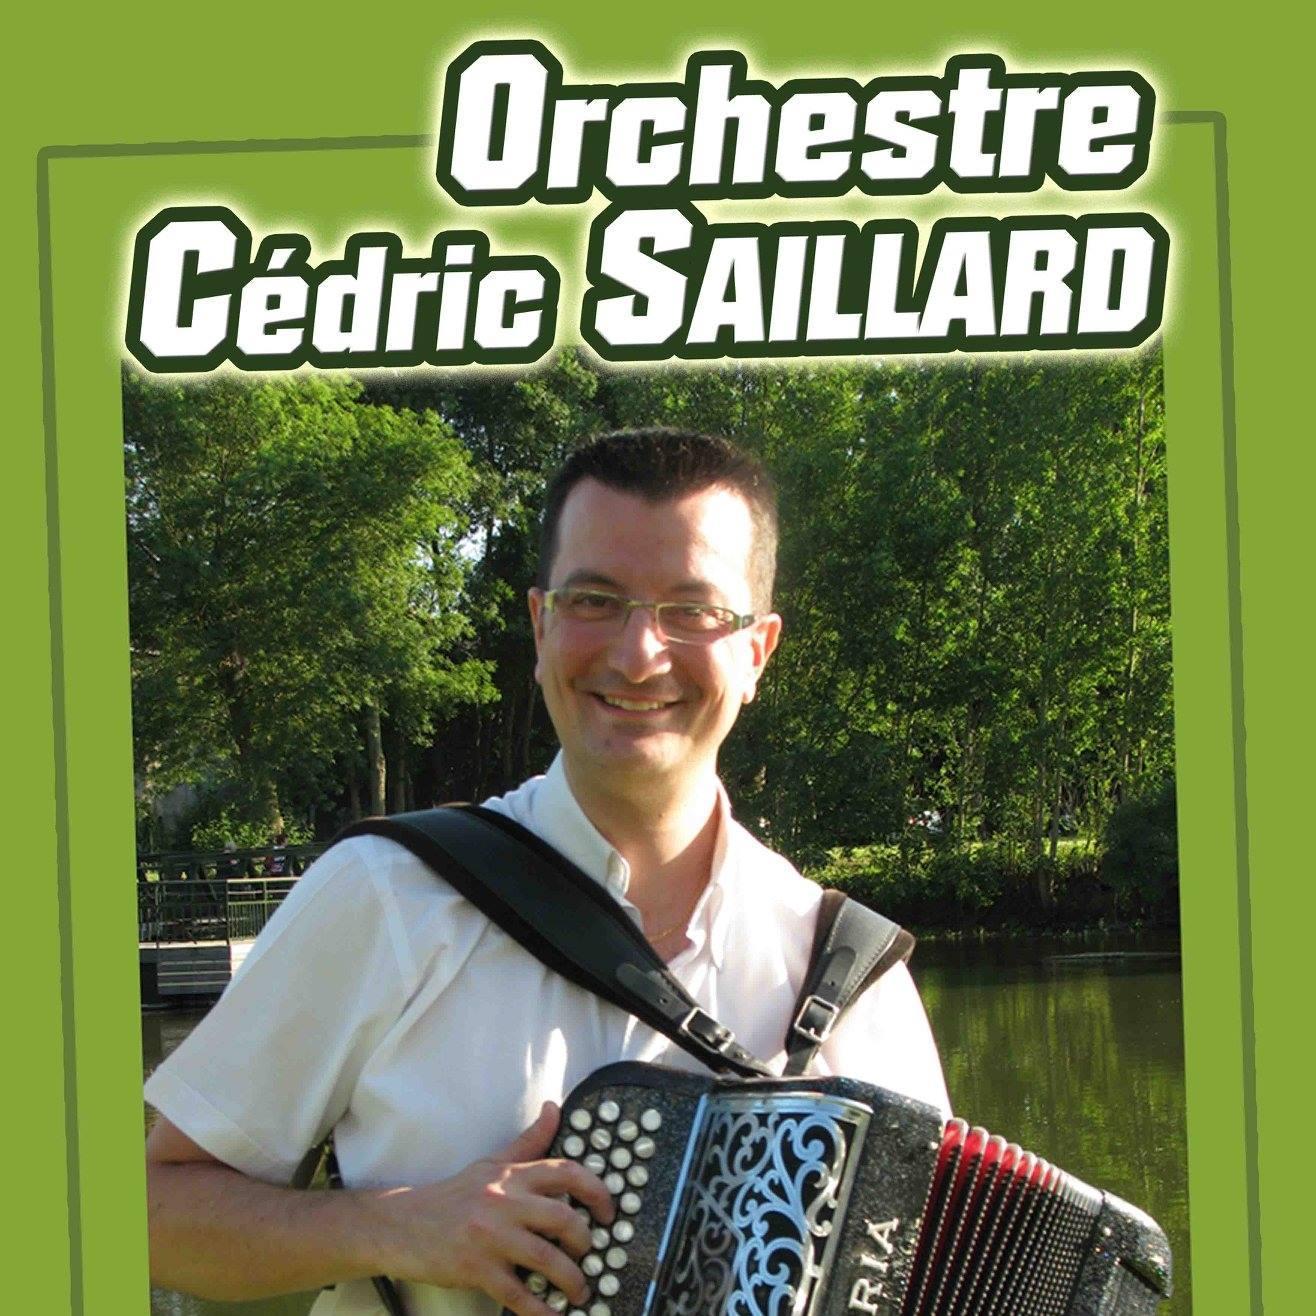 Cédric Saillard - dimanche 14 juin 2020